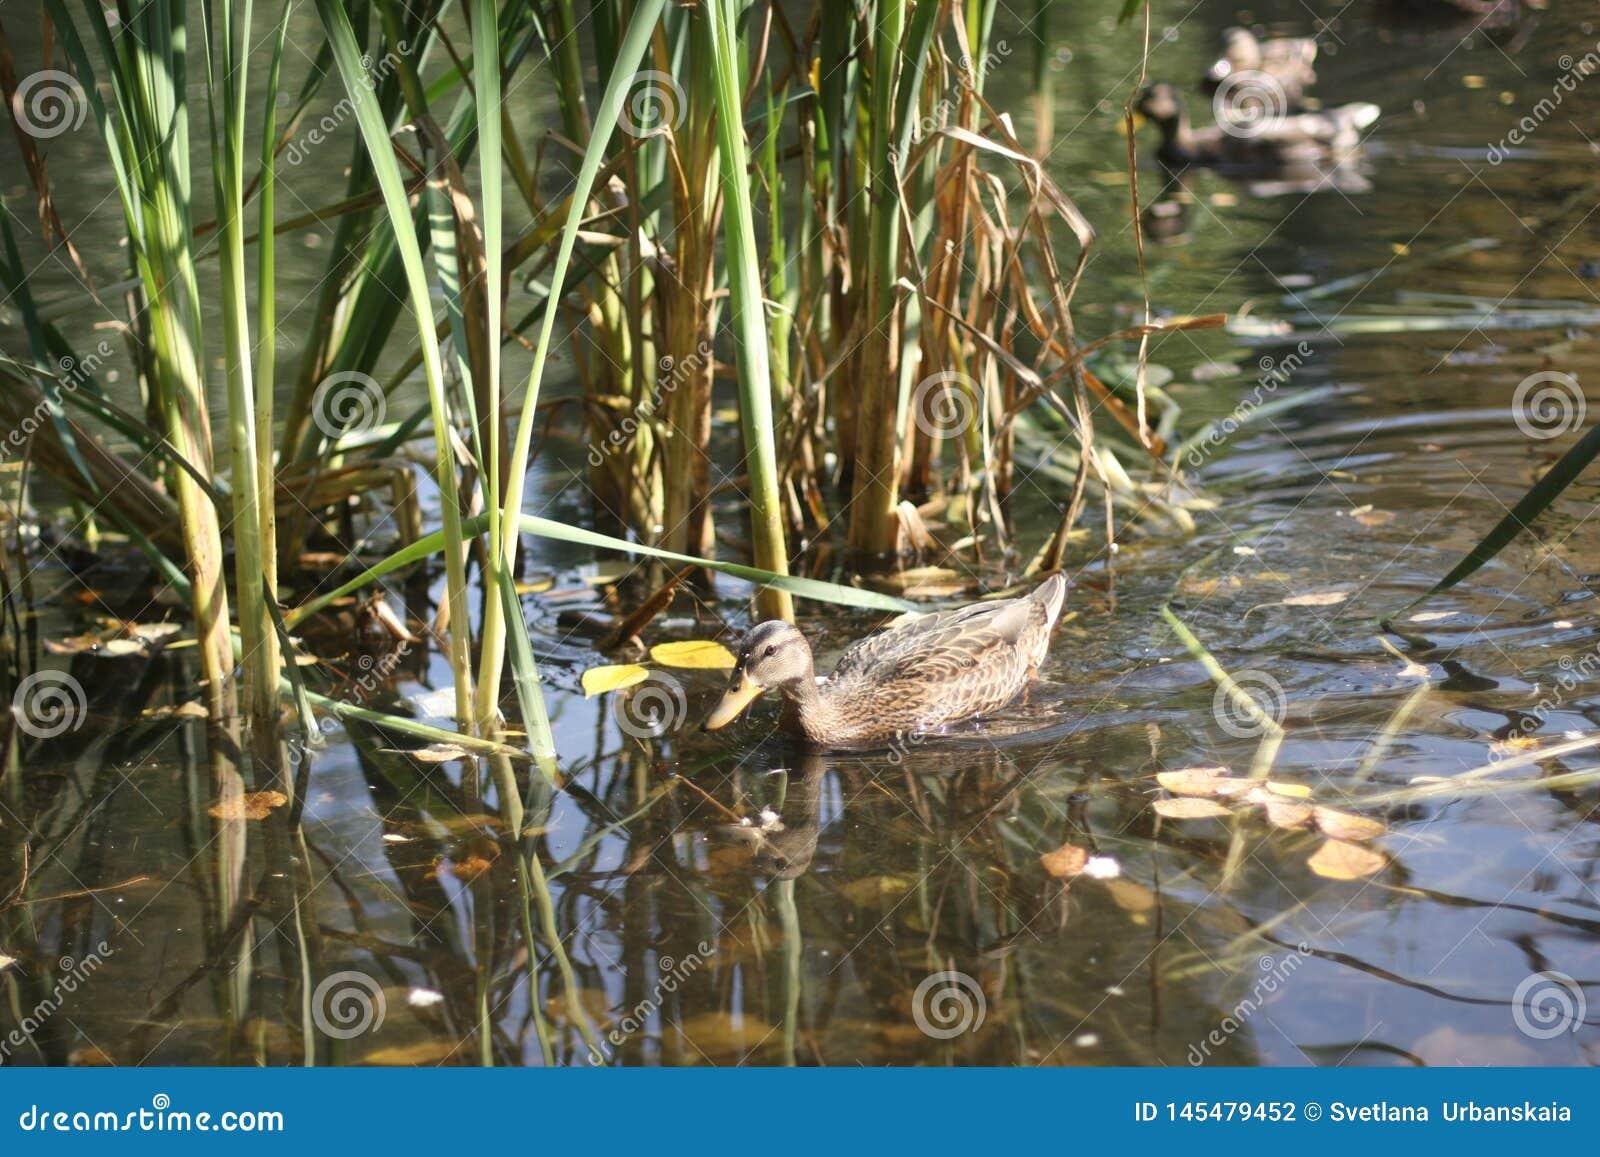 Pato na lagoa e no parque do outono